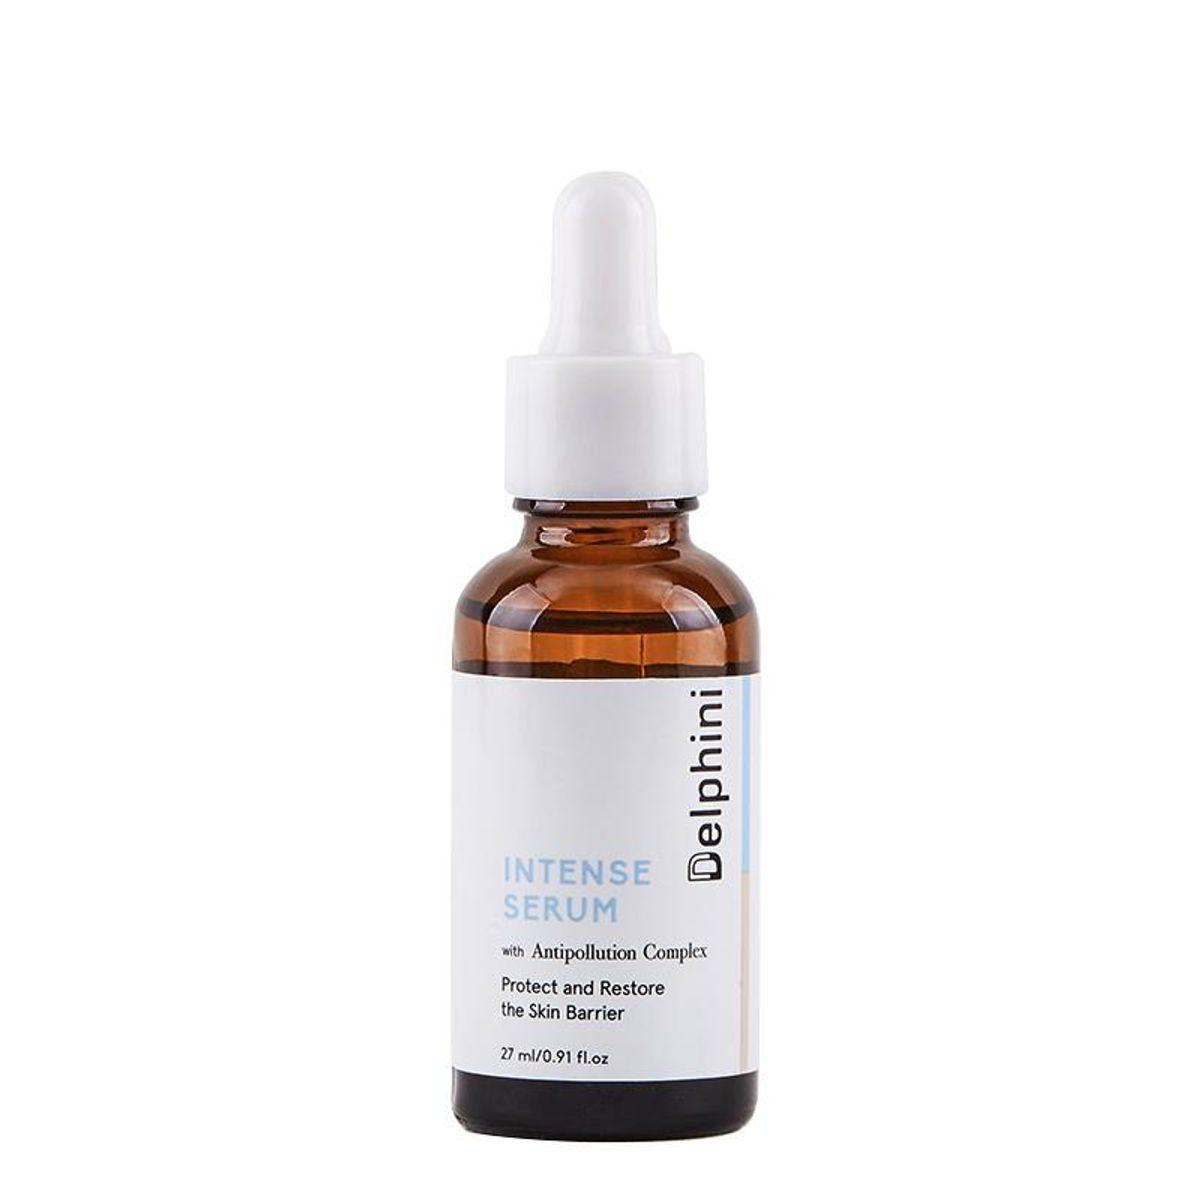 delphini intense serum with antipollution complex